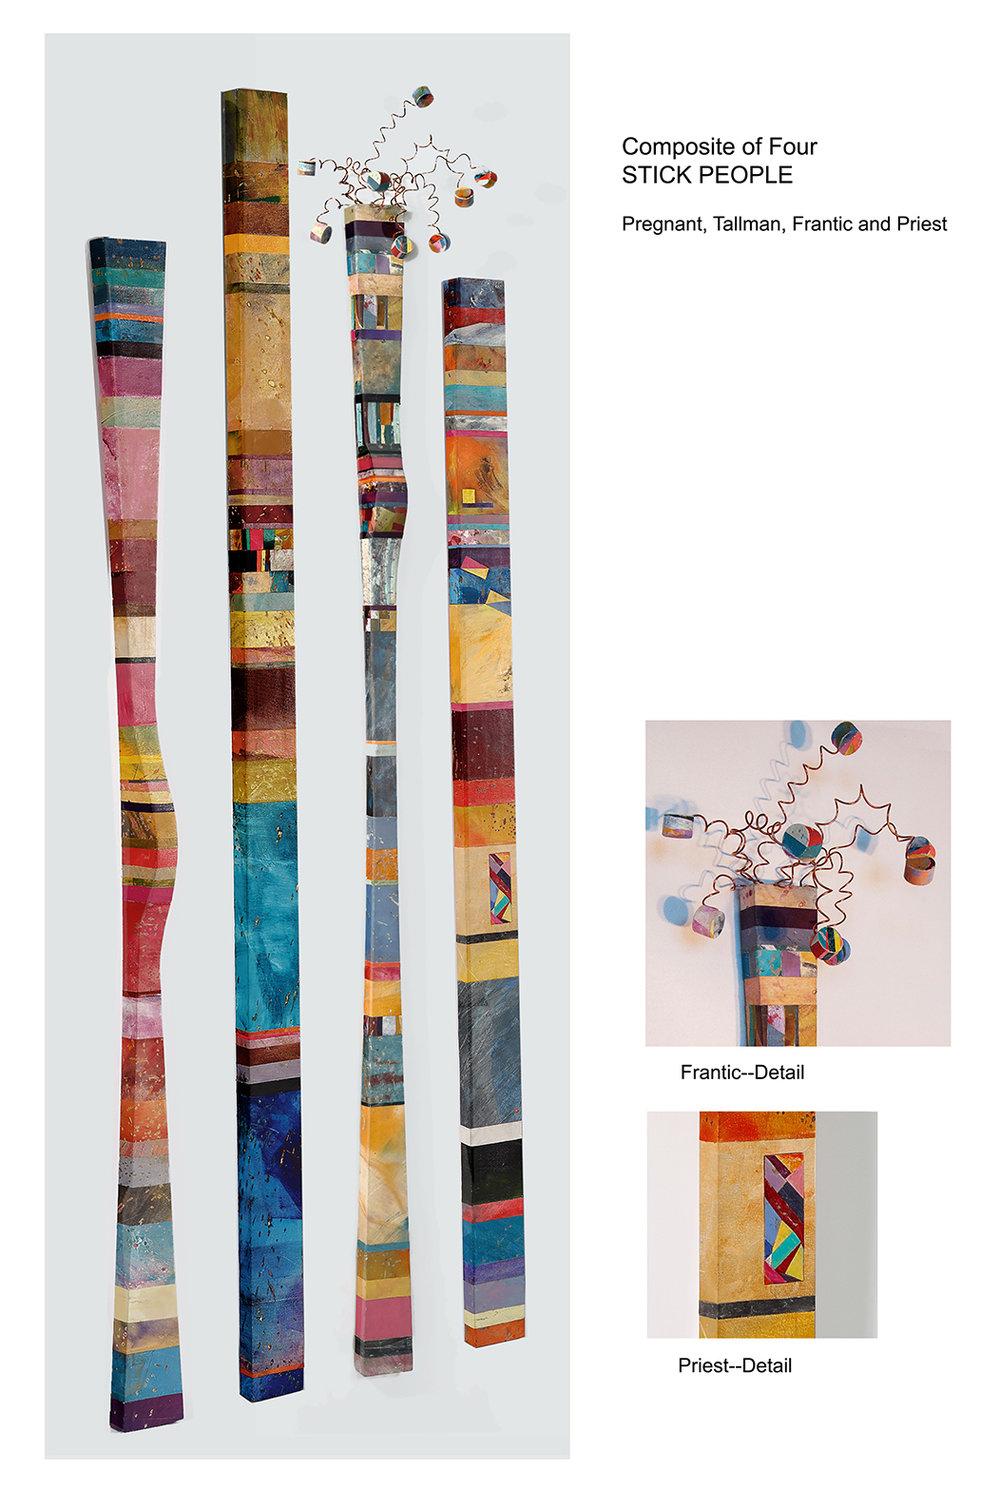 Composite of Four People Sticks